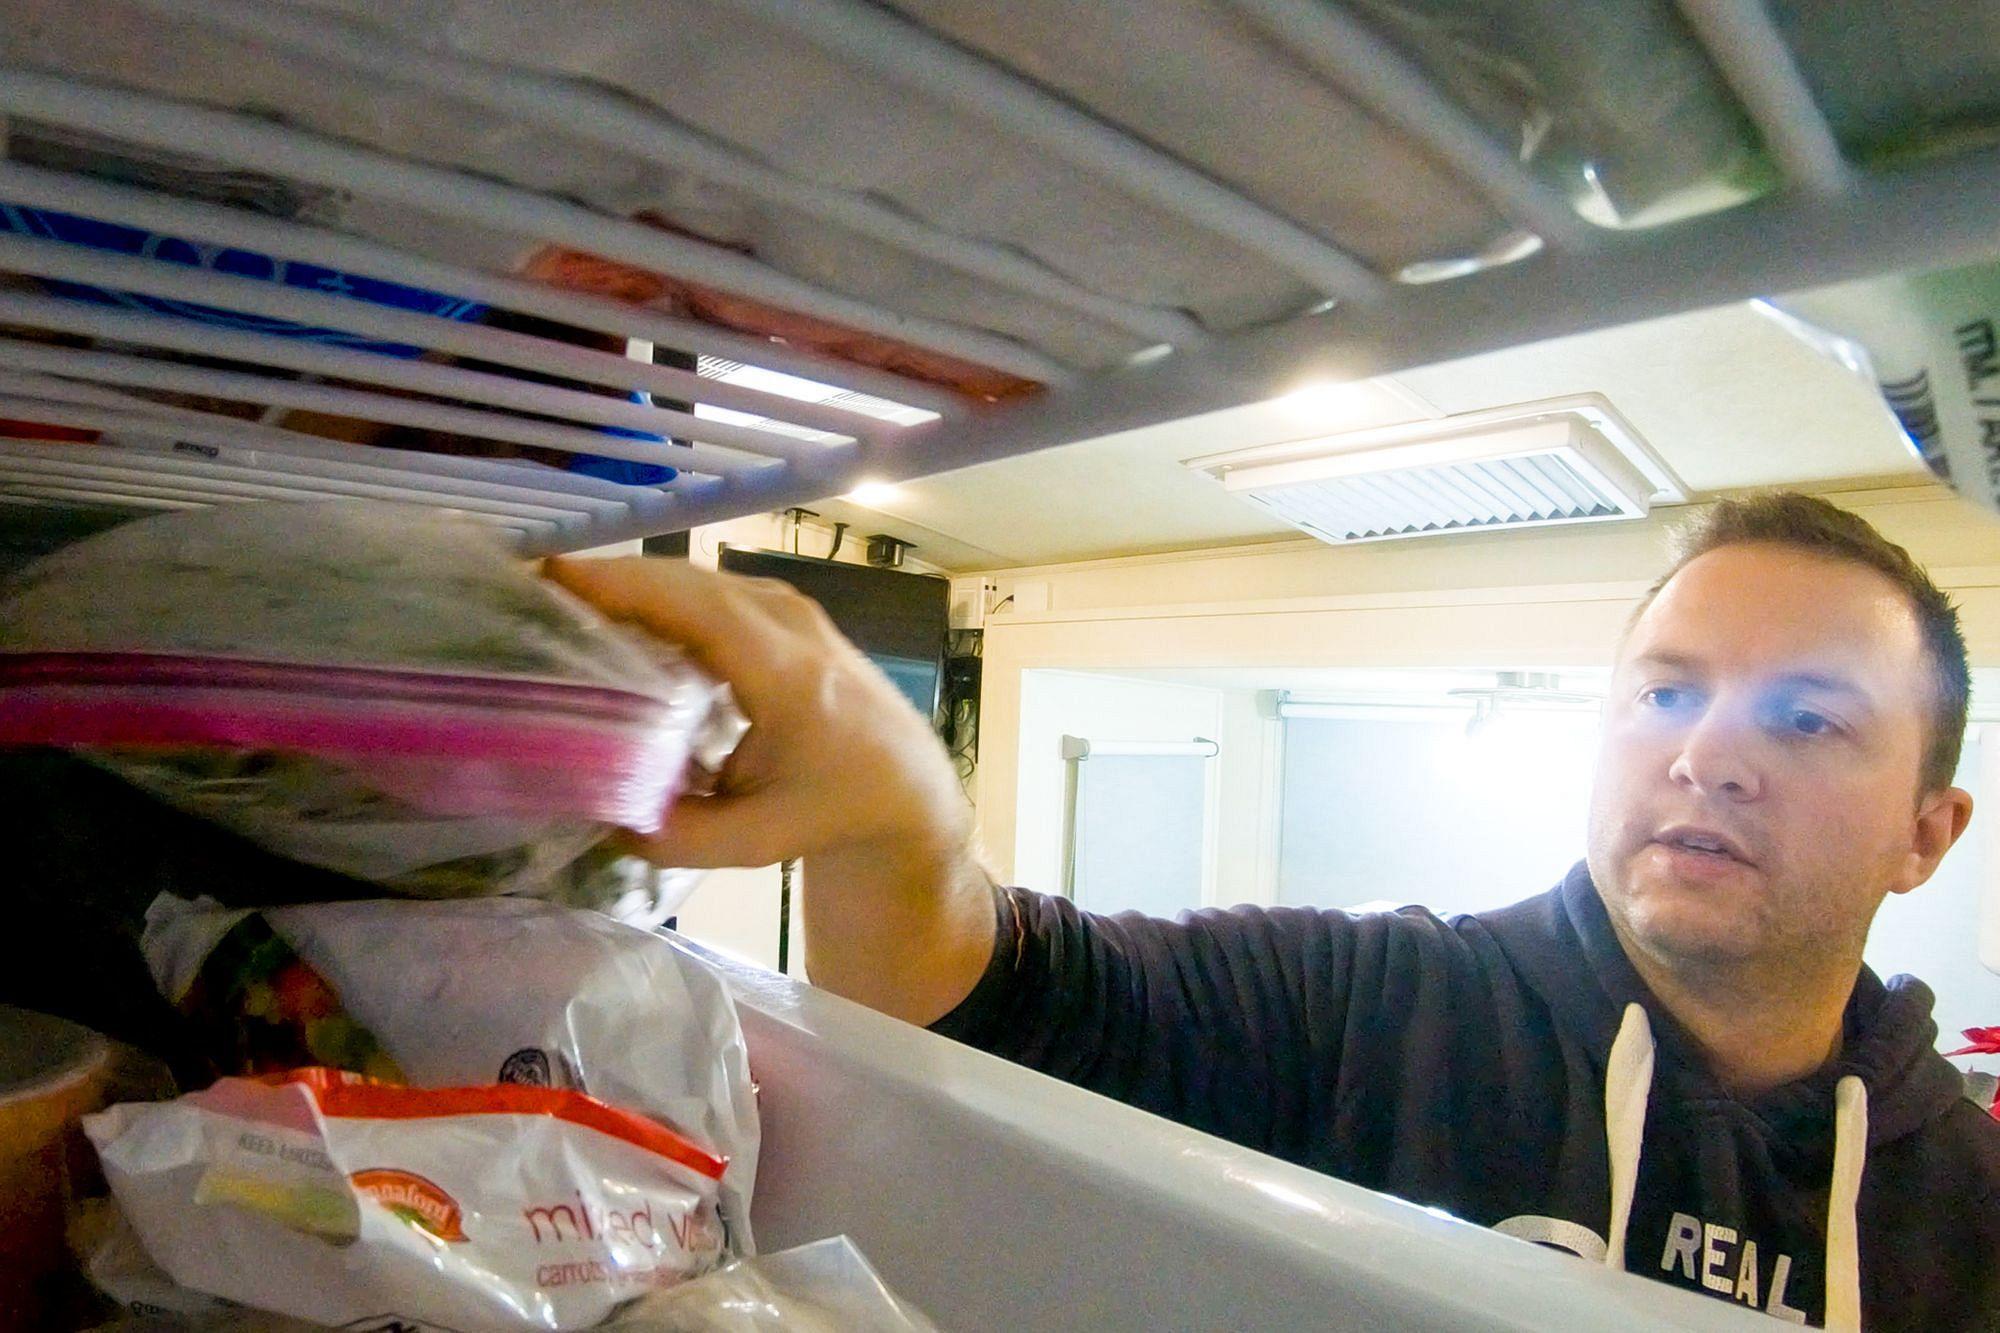 RV Freezer